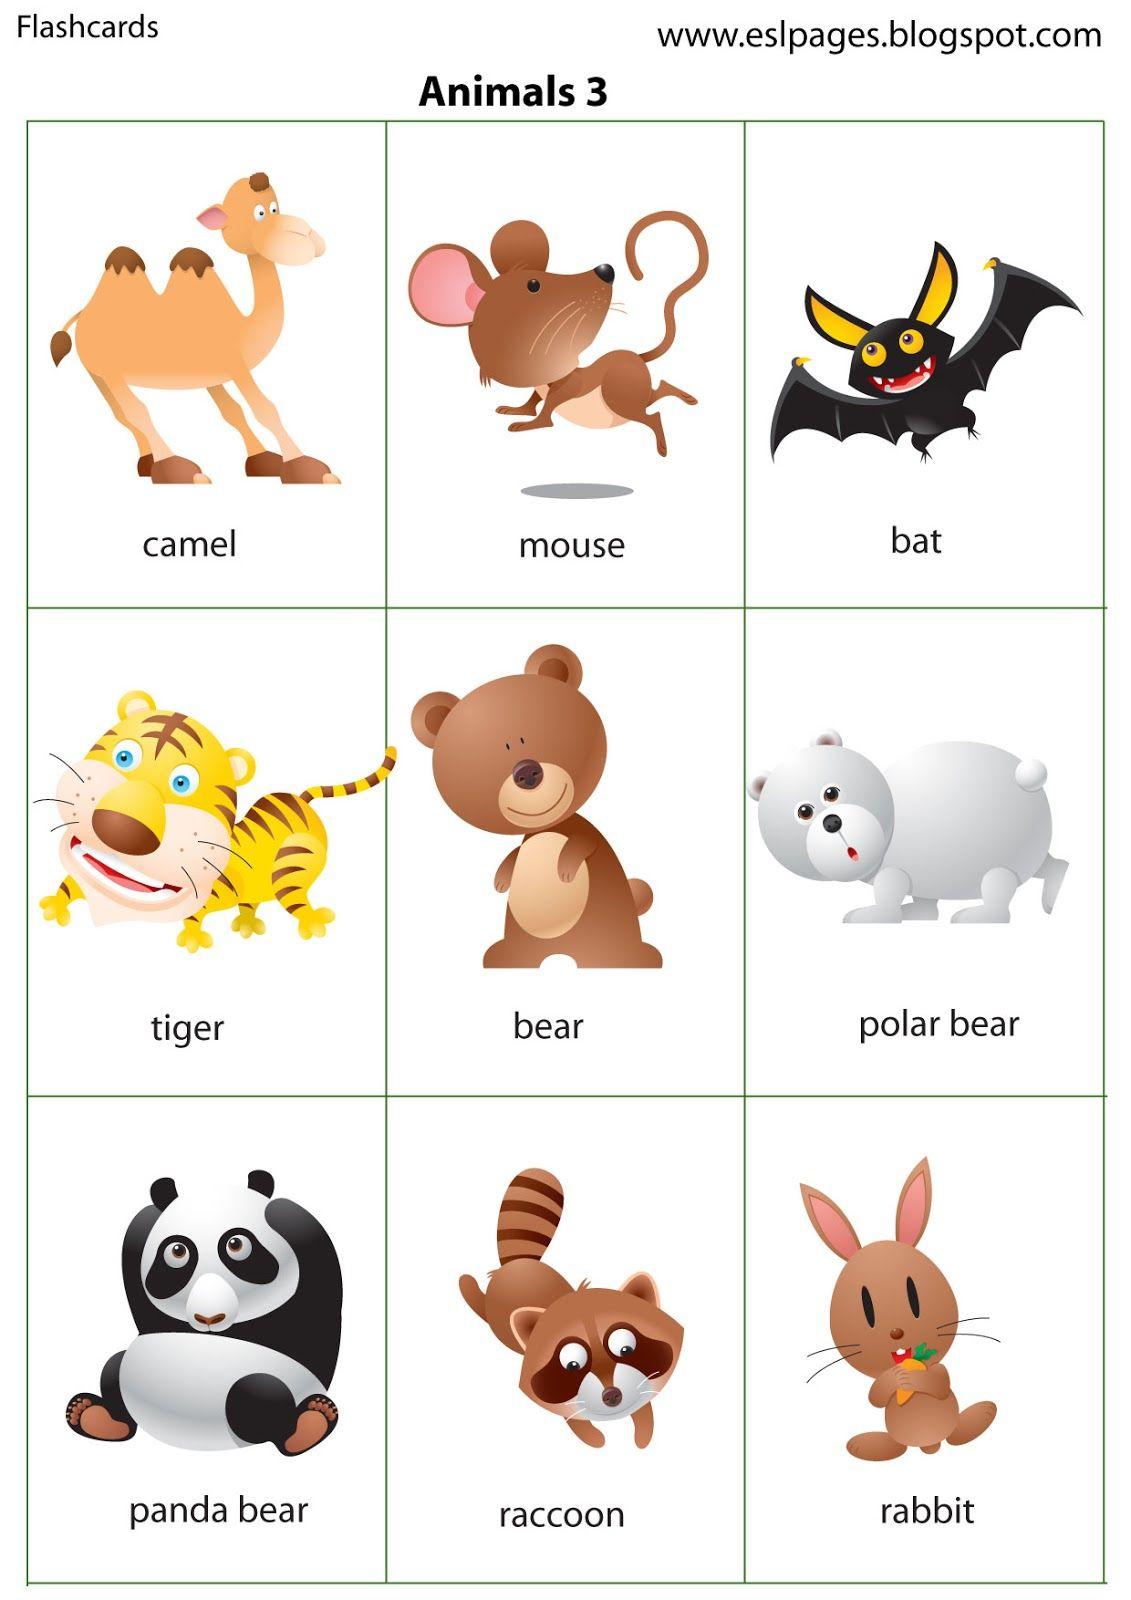 ocean animal description cards for kids printable pdf versions